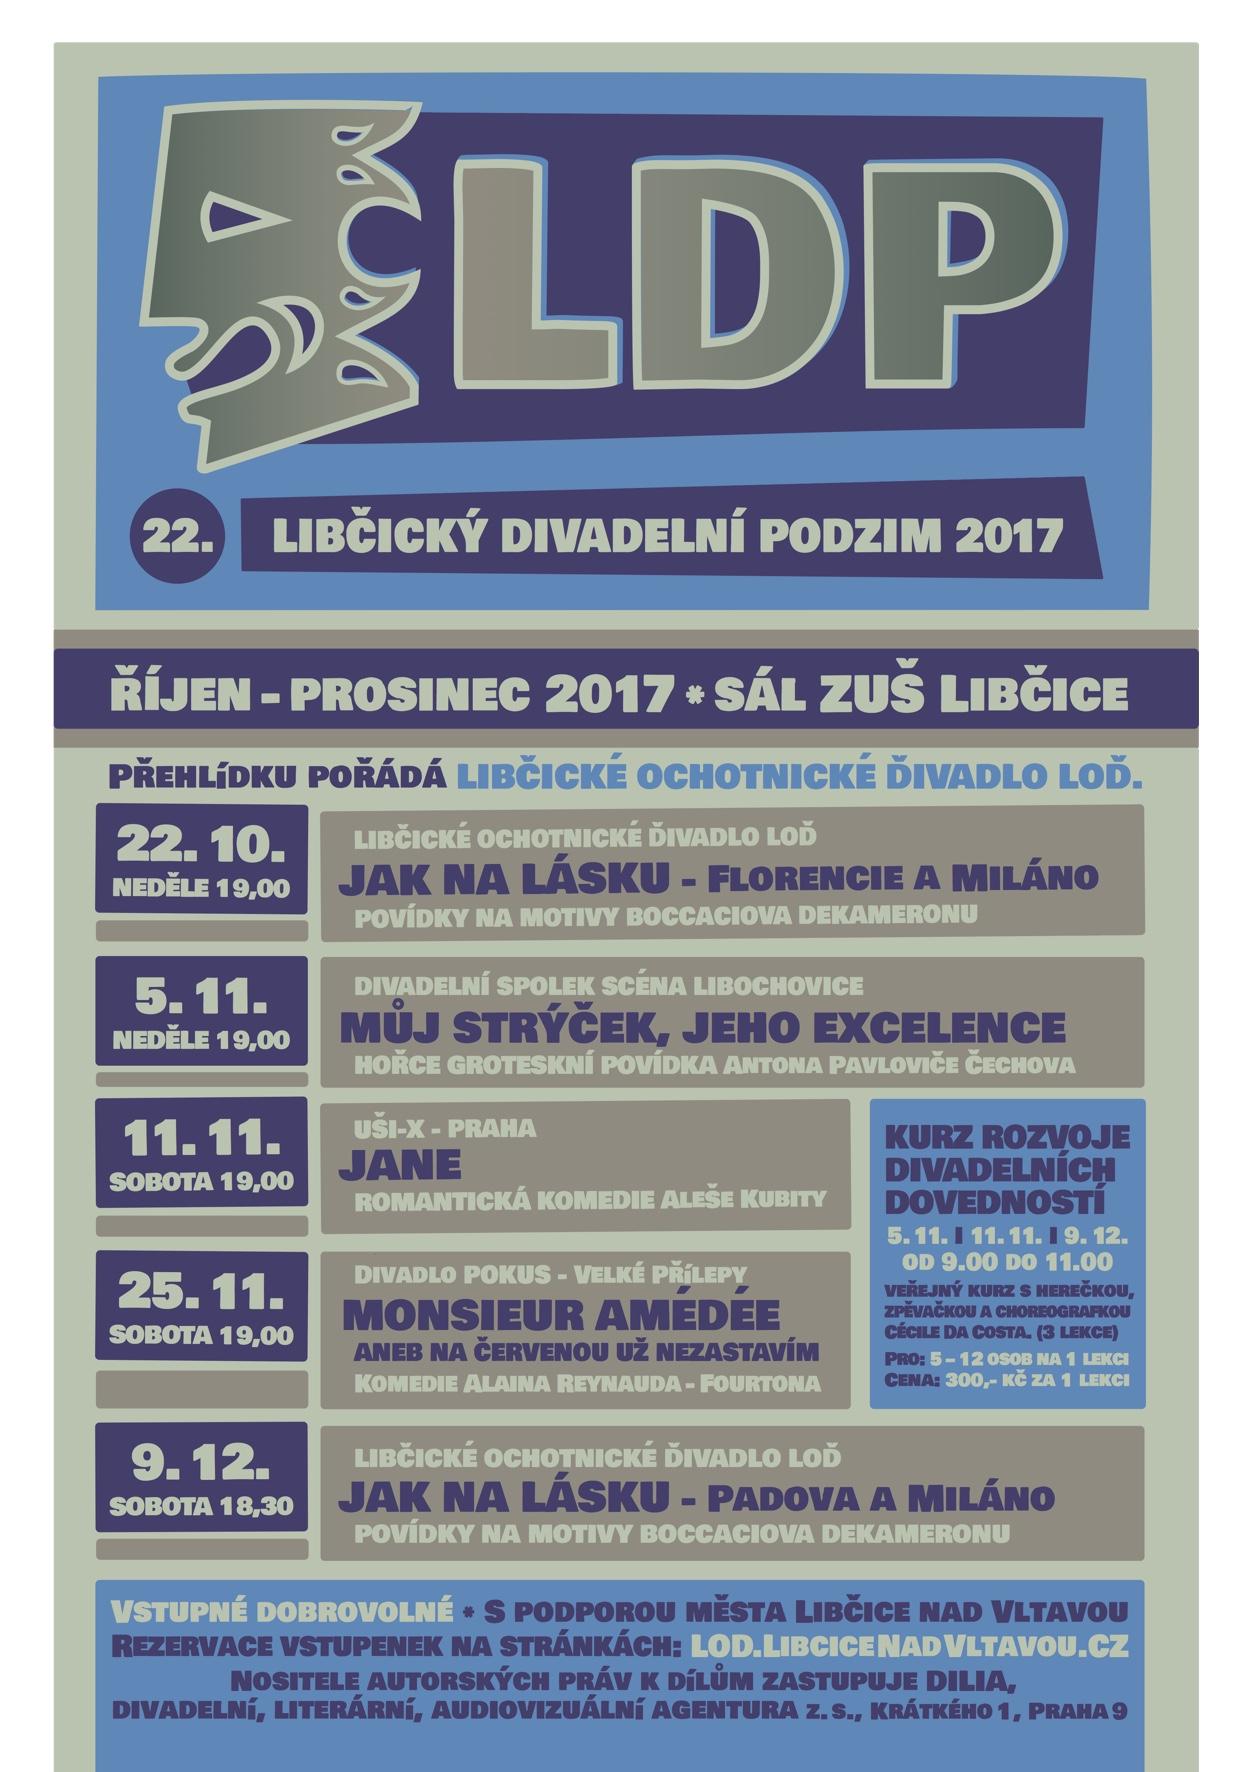 LDP 2017: program